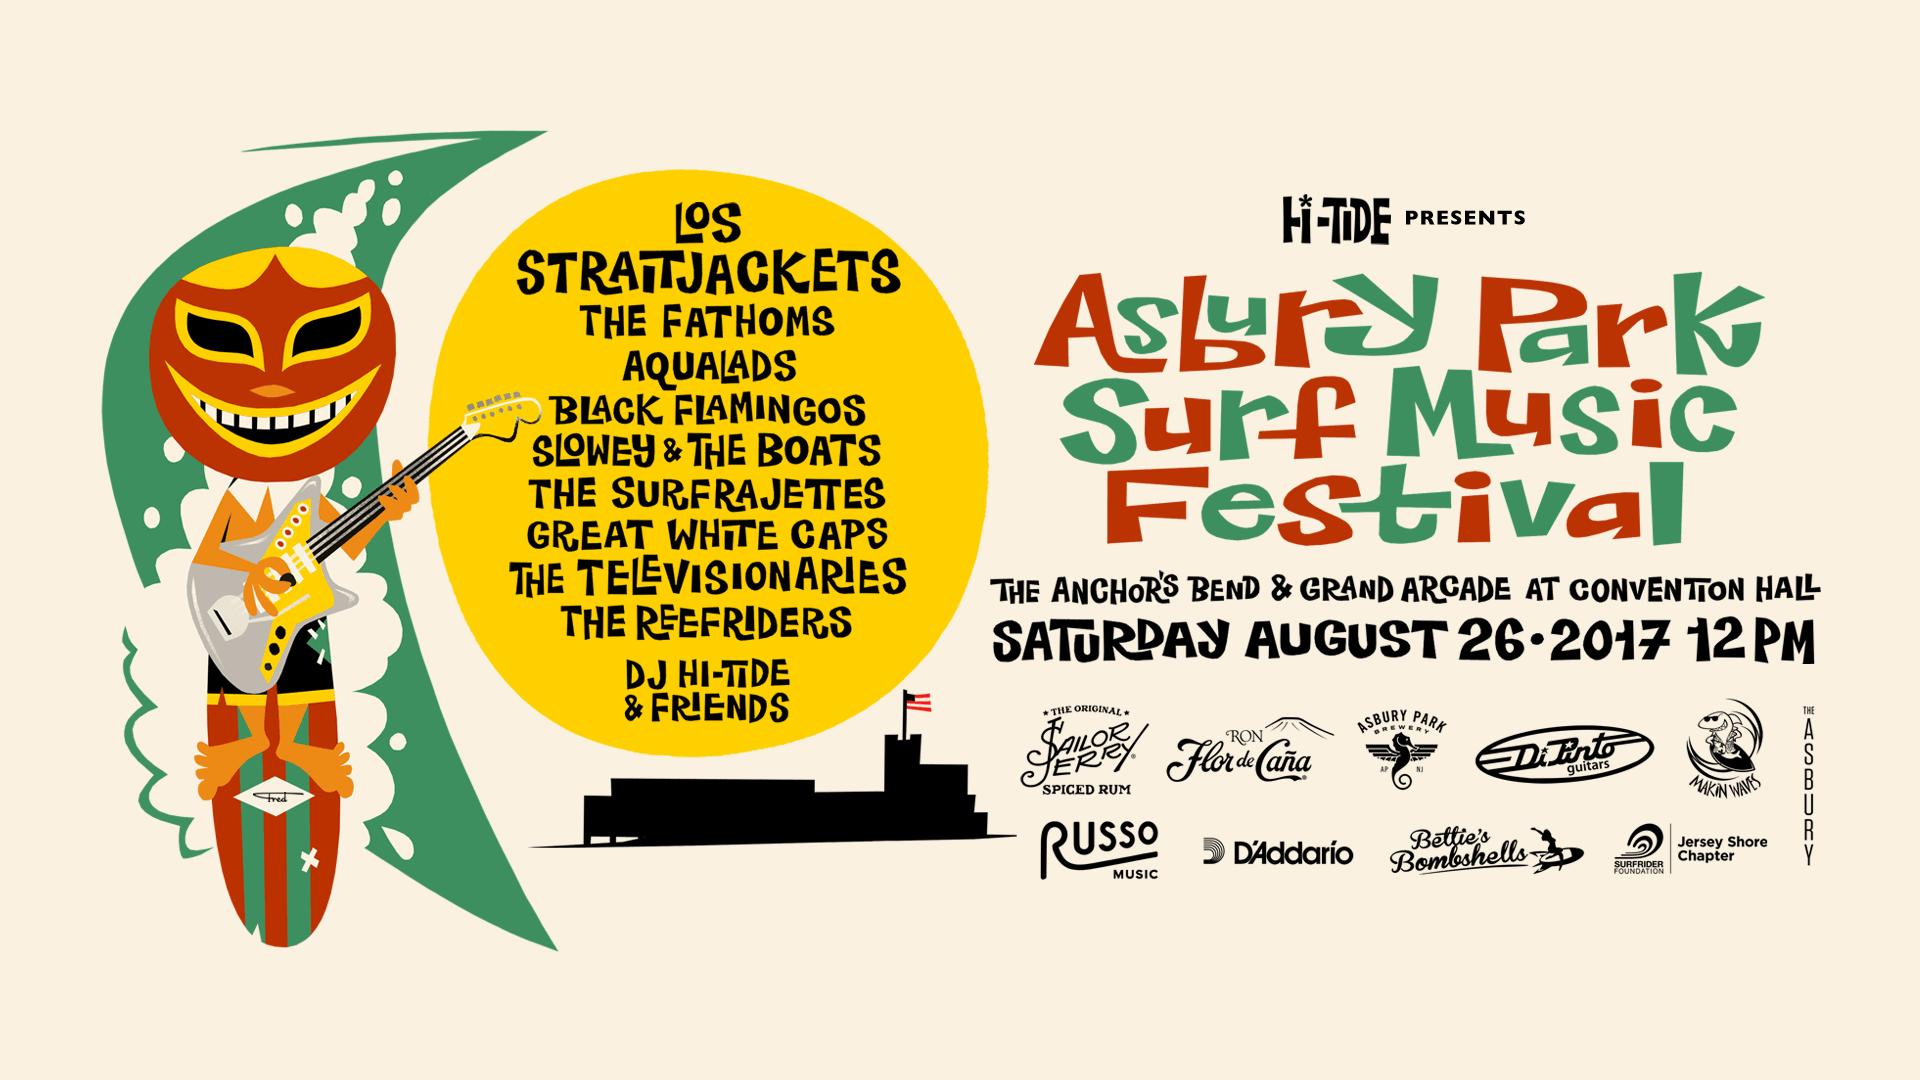 Asbury Park Surf Music Festival 2017